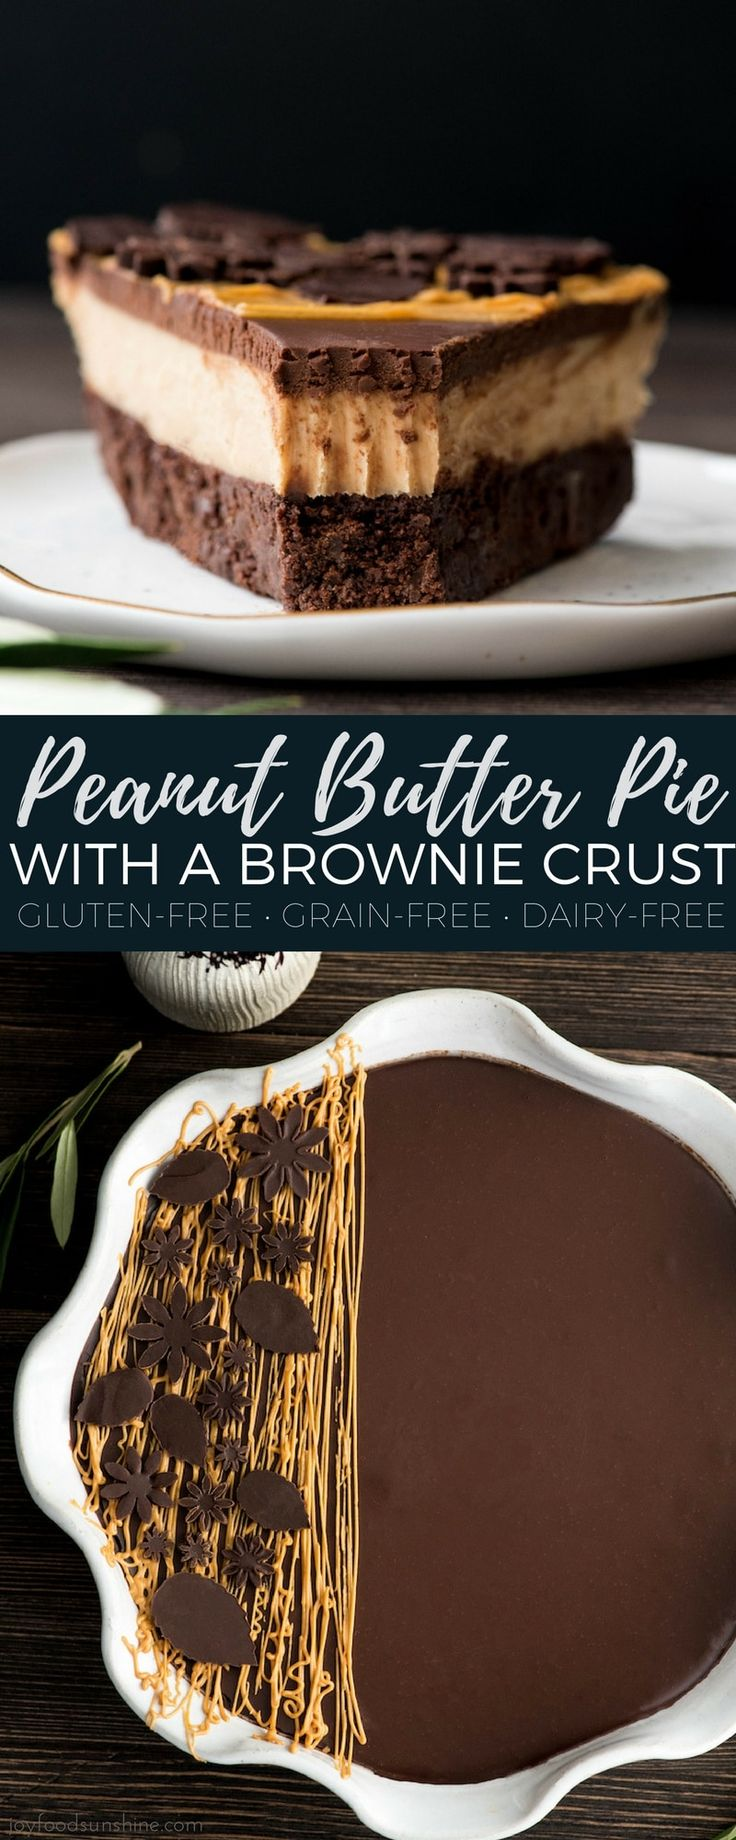 Peanut Butter Pie with a Brownie Crust (Gluten-Free & Dairy-Free) - Joyfoodsunshine